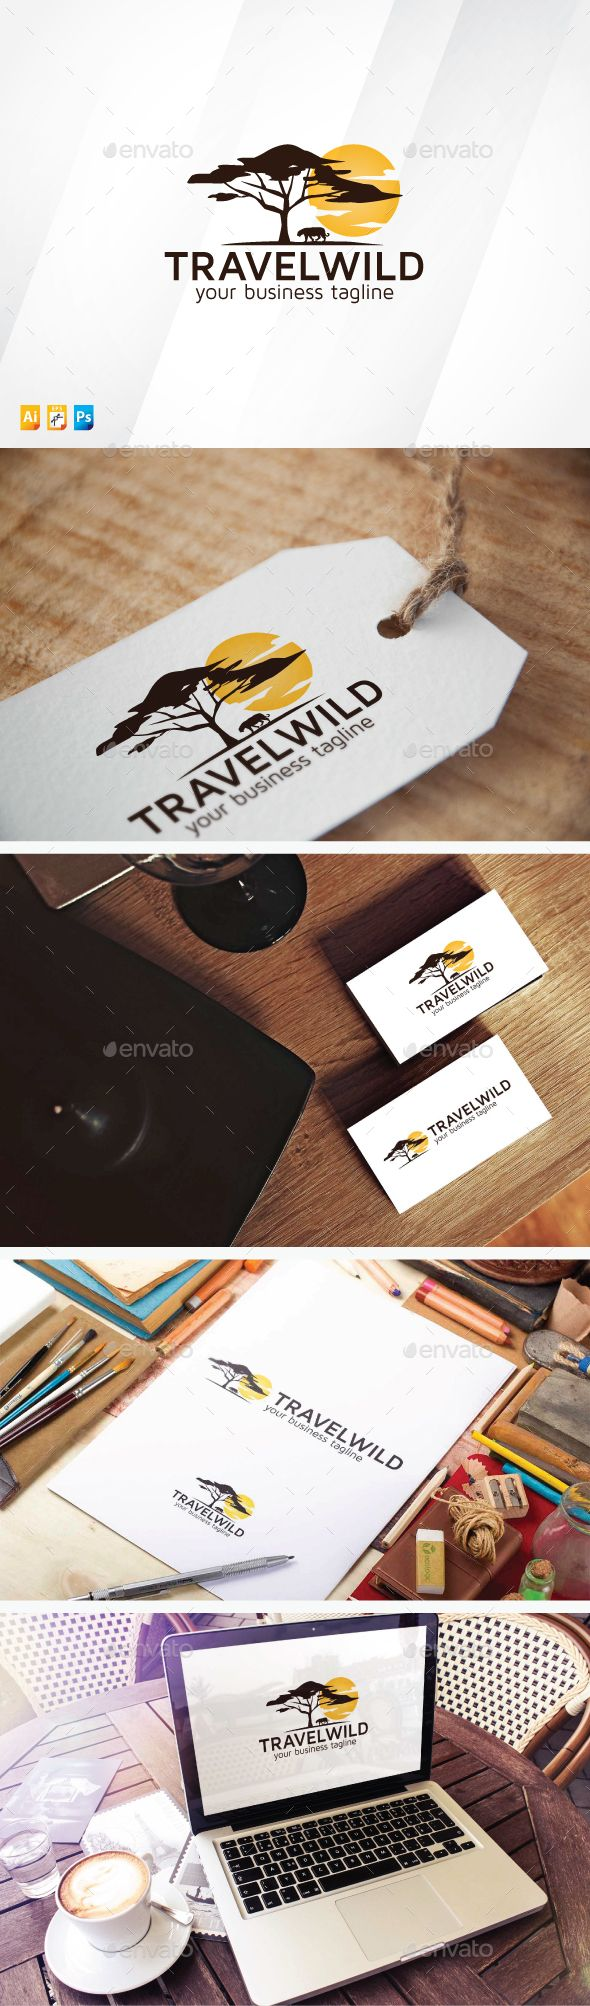 Travel Wild - Logo Design Template Vector #logotype Download it here: http://graphicriver.net/item/travel-wild/13398200?s_rank=373?ref=nexion